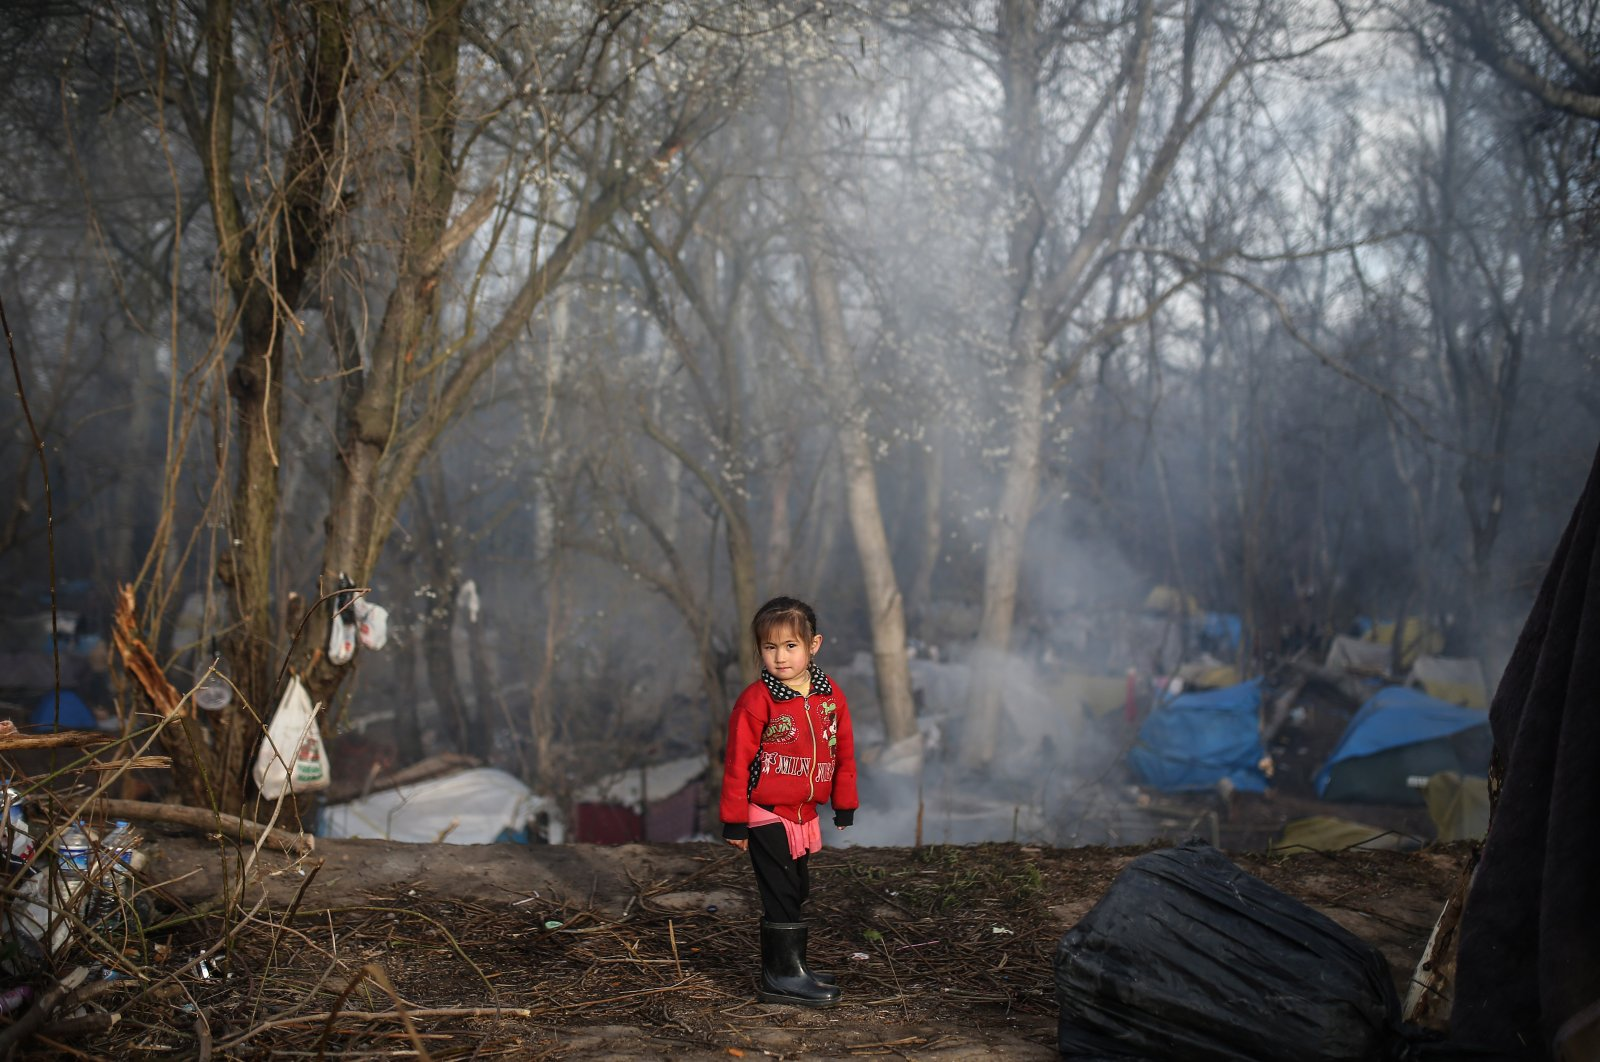 Syrian refugee child pictured near the Pazarkule border gate in Turkey's Edirne province (AA Photo)